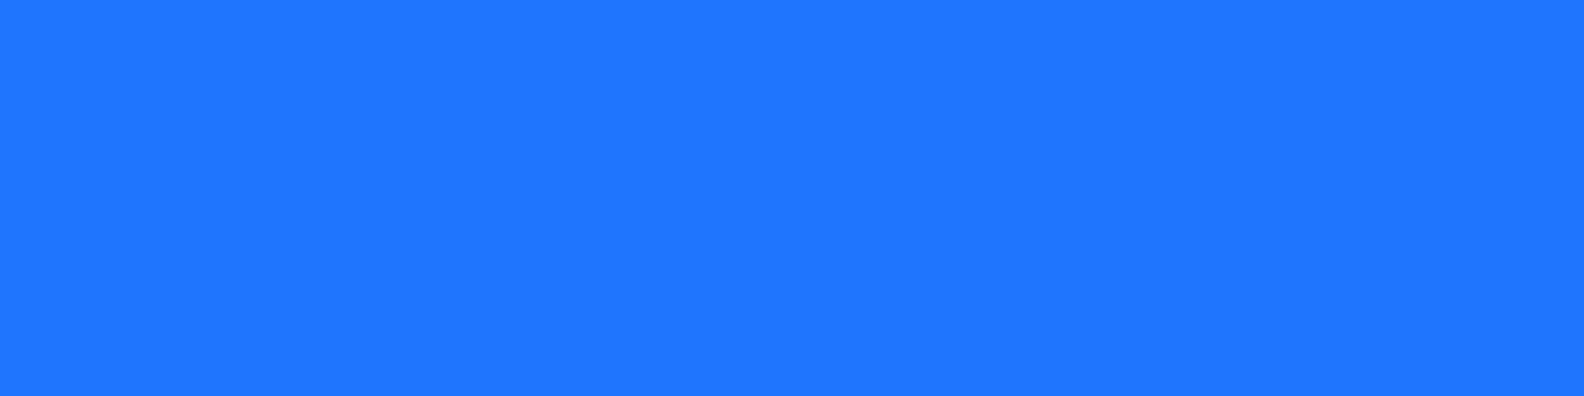 1584x396 Blue Crayola Solid Color Background